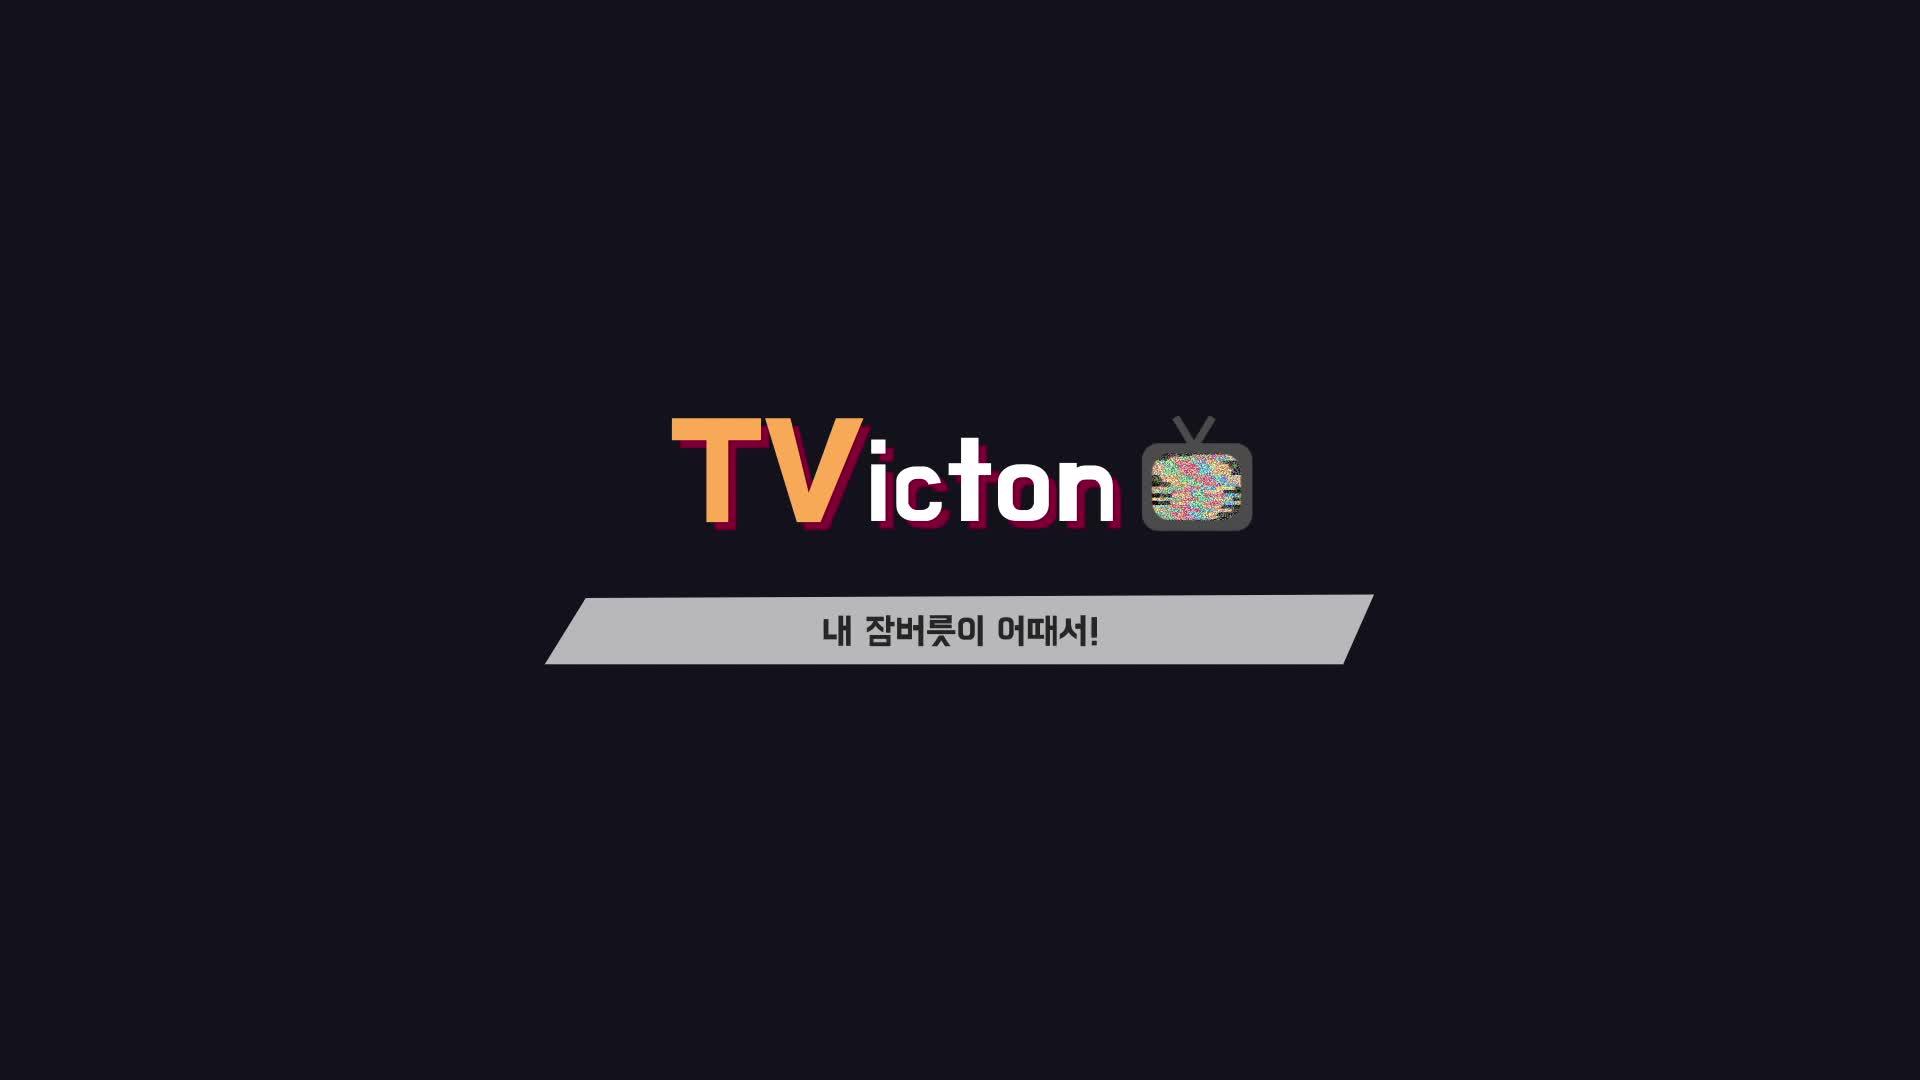 TVicton (내 잠버릇이 어때서!)